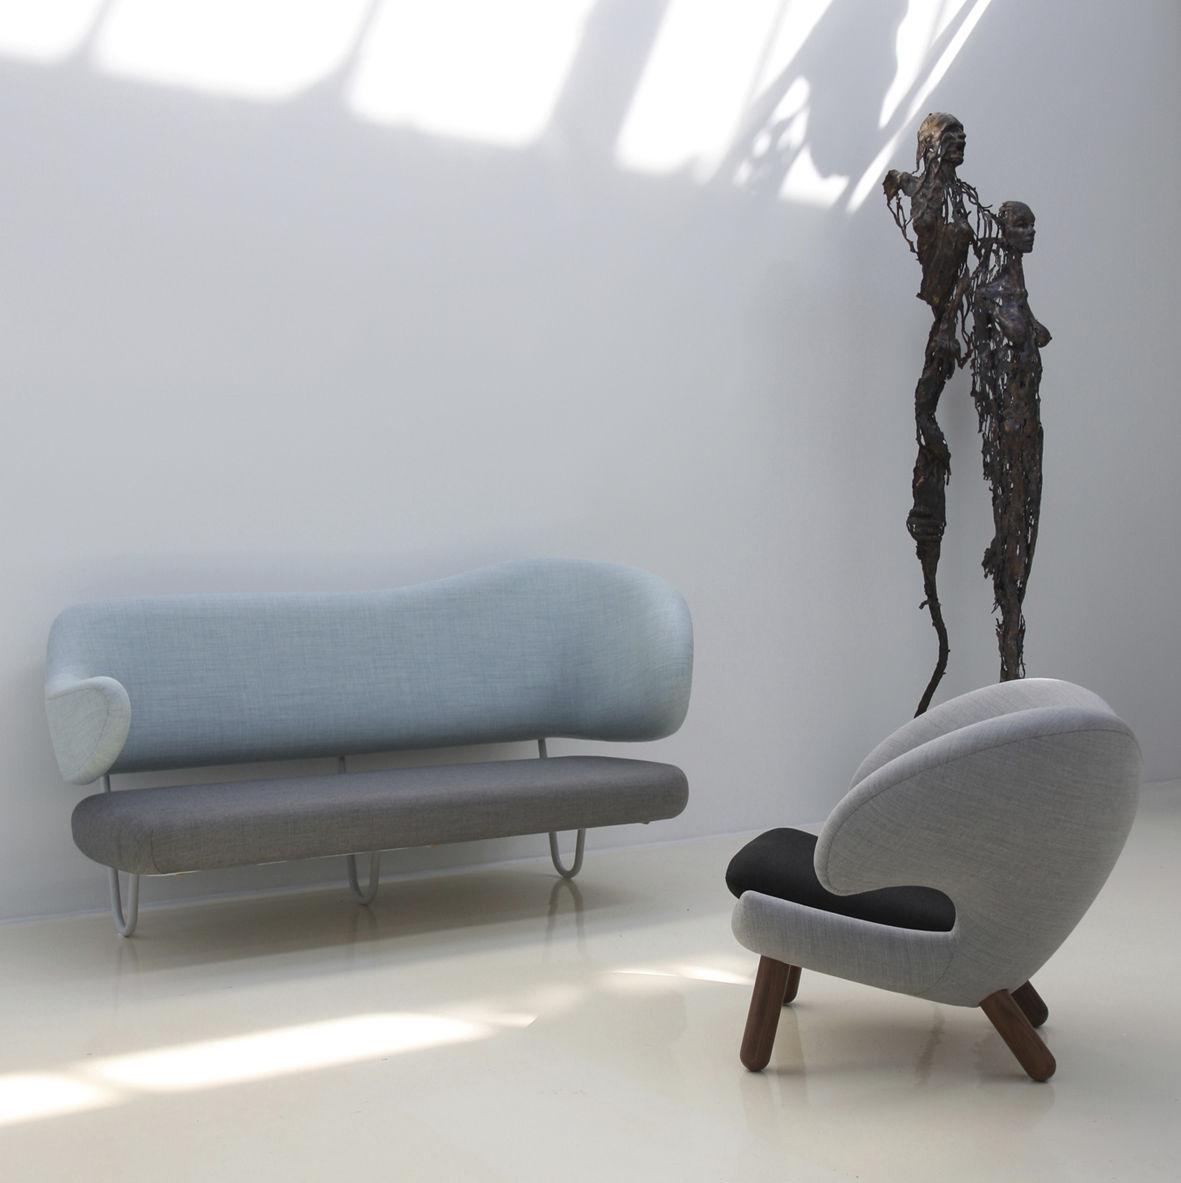 Scandinavian Design Sofa / Fabric / Lacquered Steel / By Finn Juhl   WALL